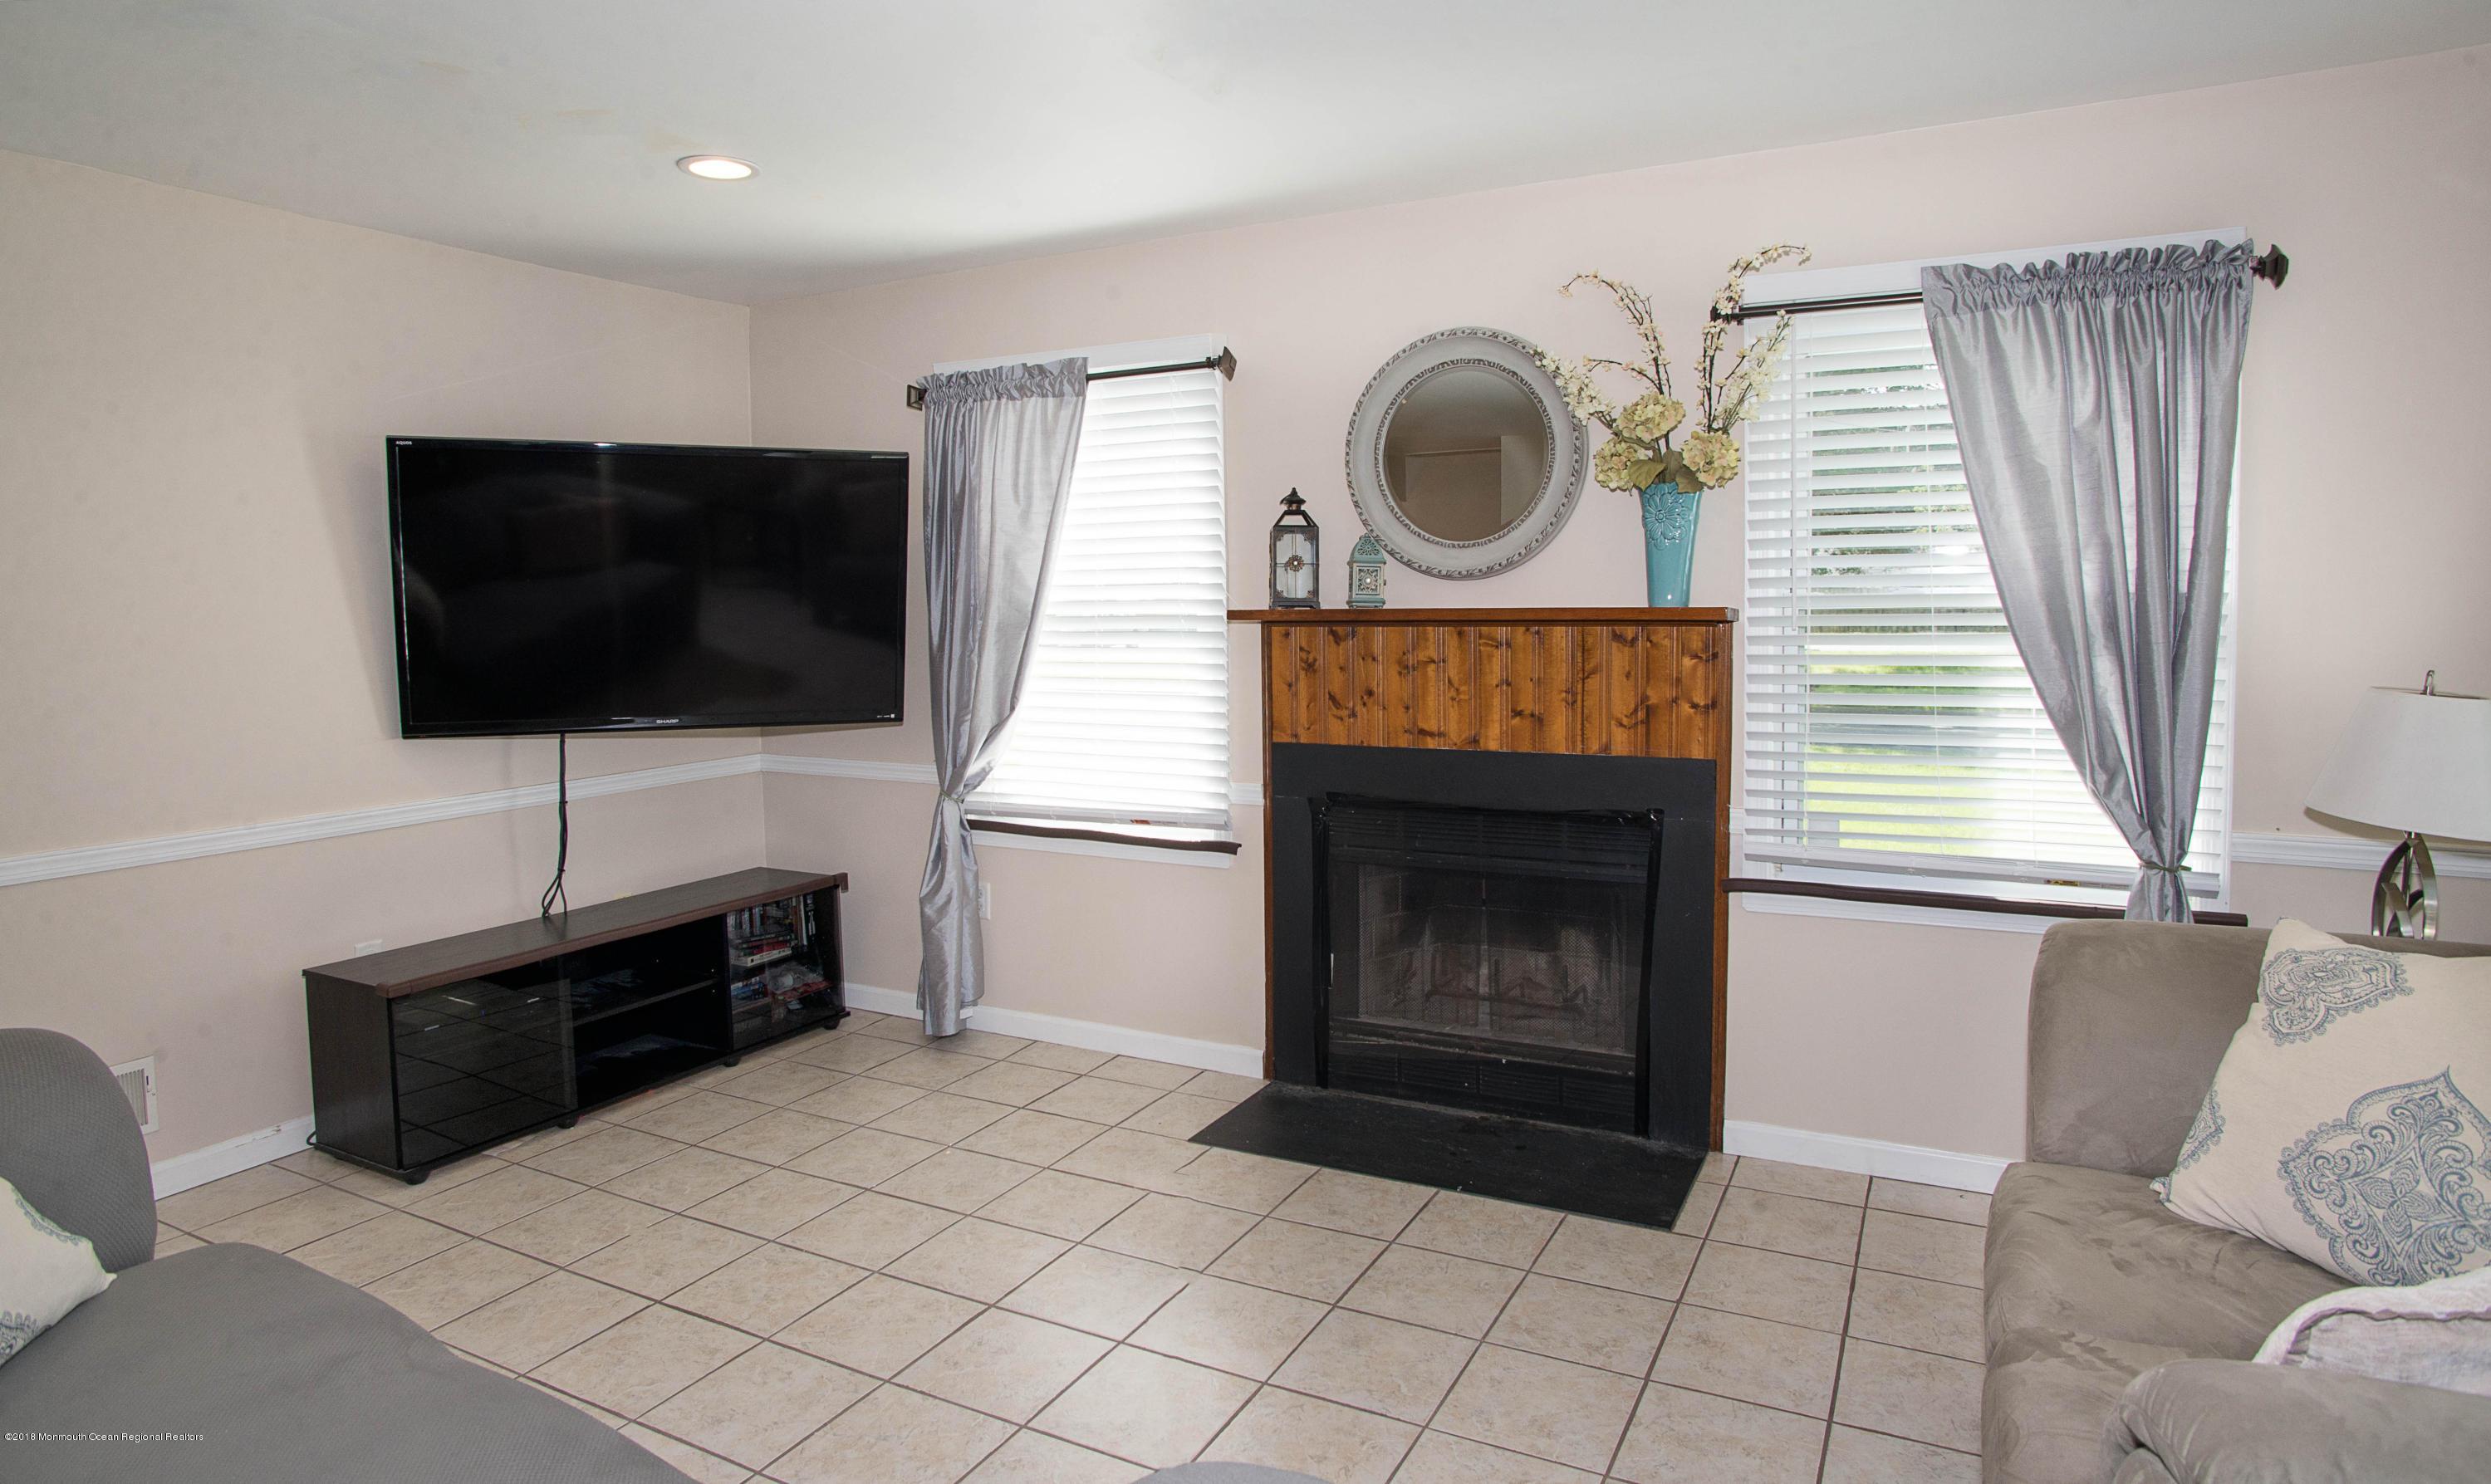 _RMJ7384.jpg living room